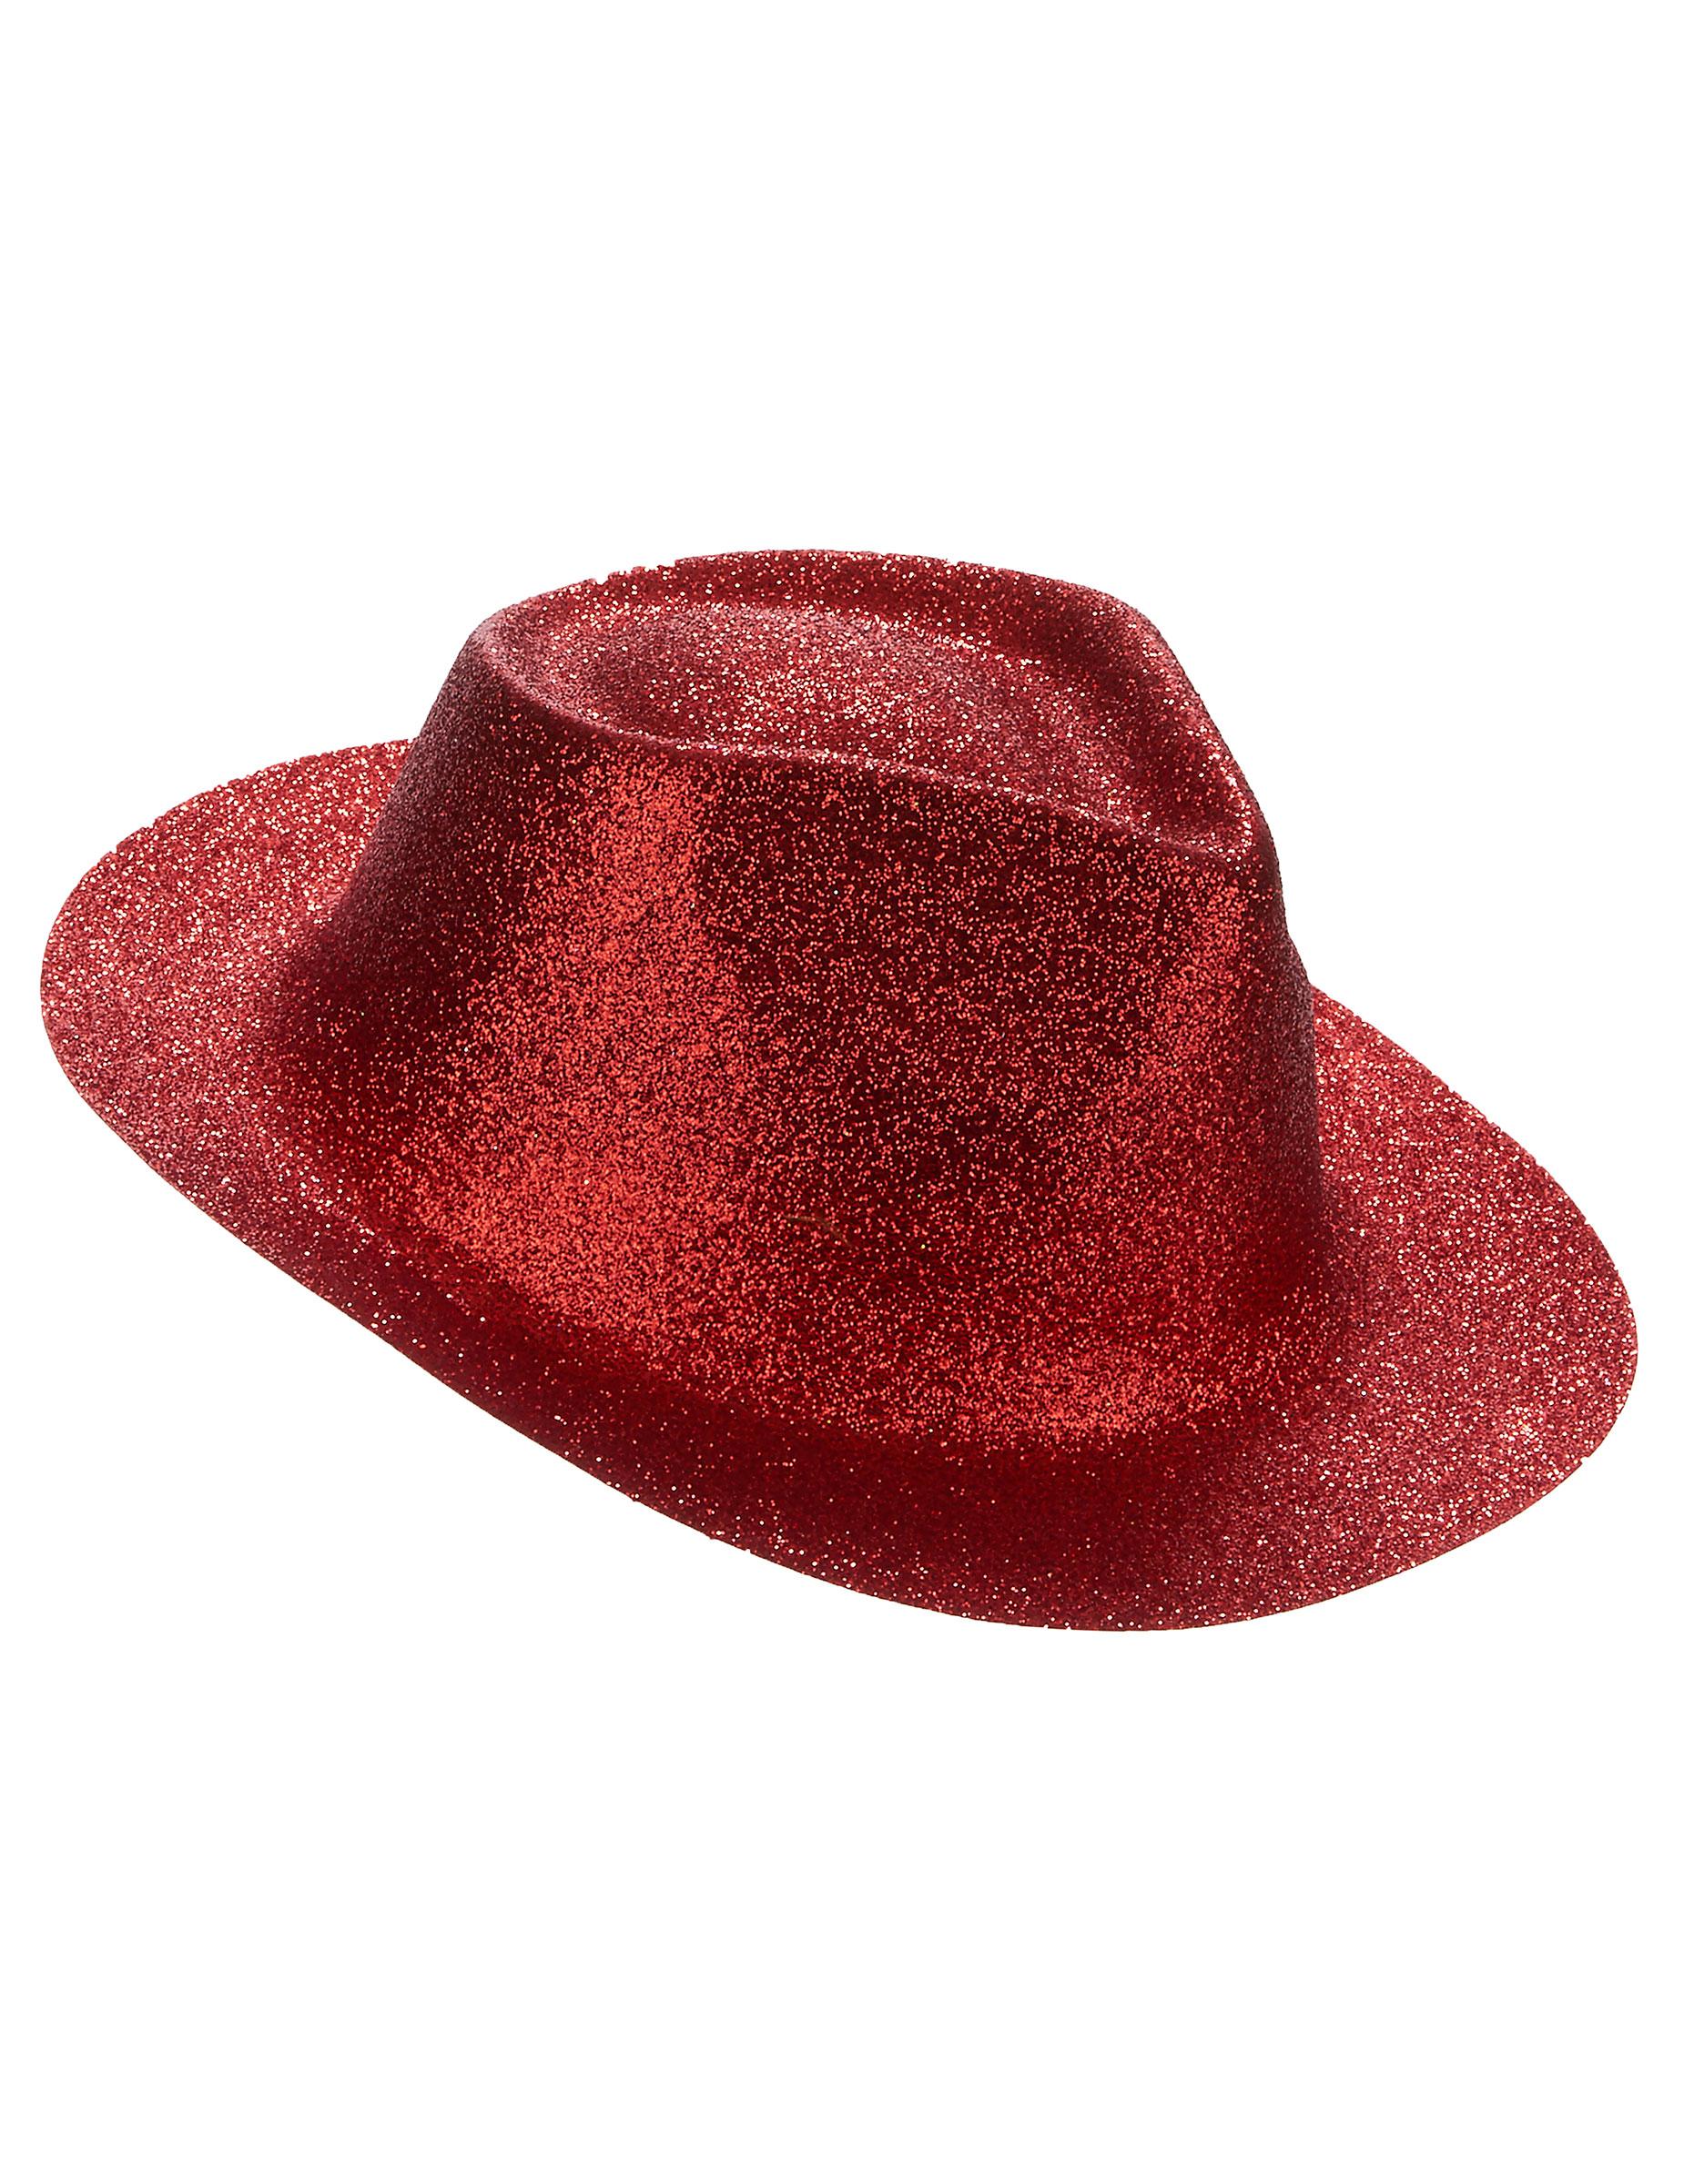 rød hat